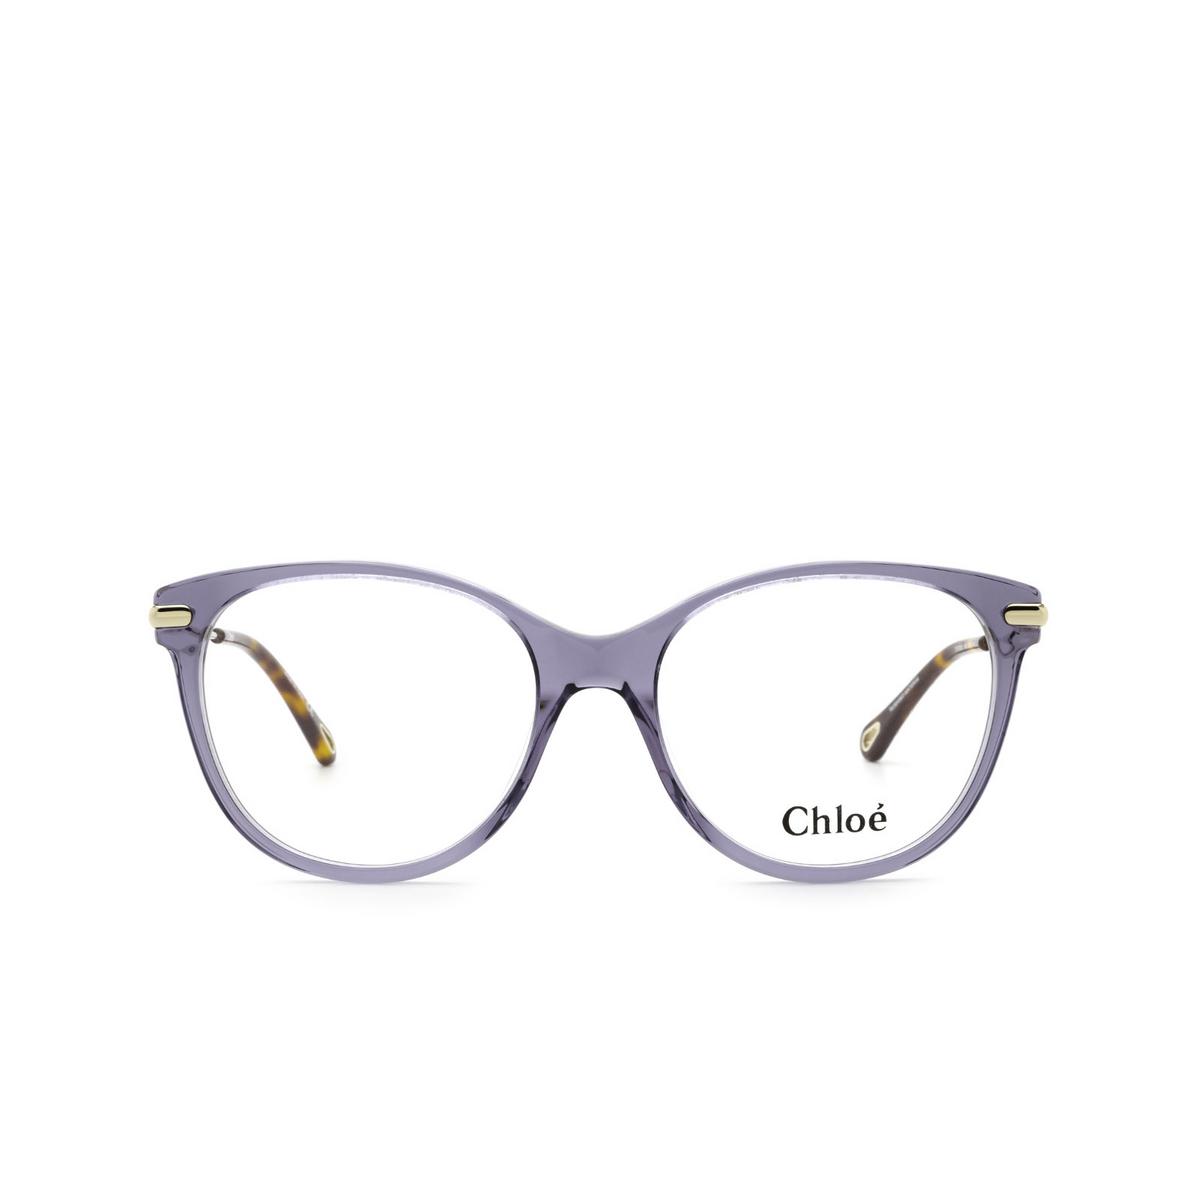 Chloé® Cat-eye Eyeglasses: CH0058O color Blue 008 - front view.